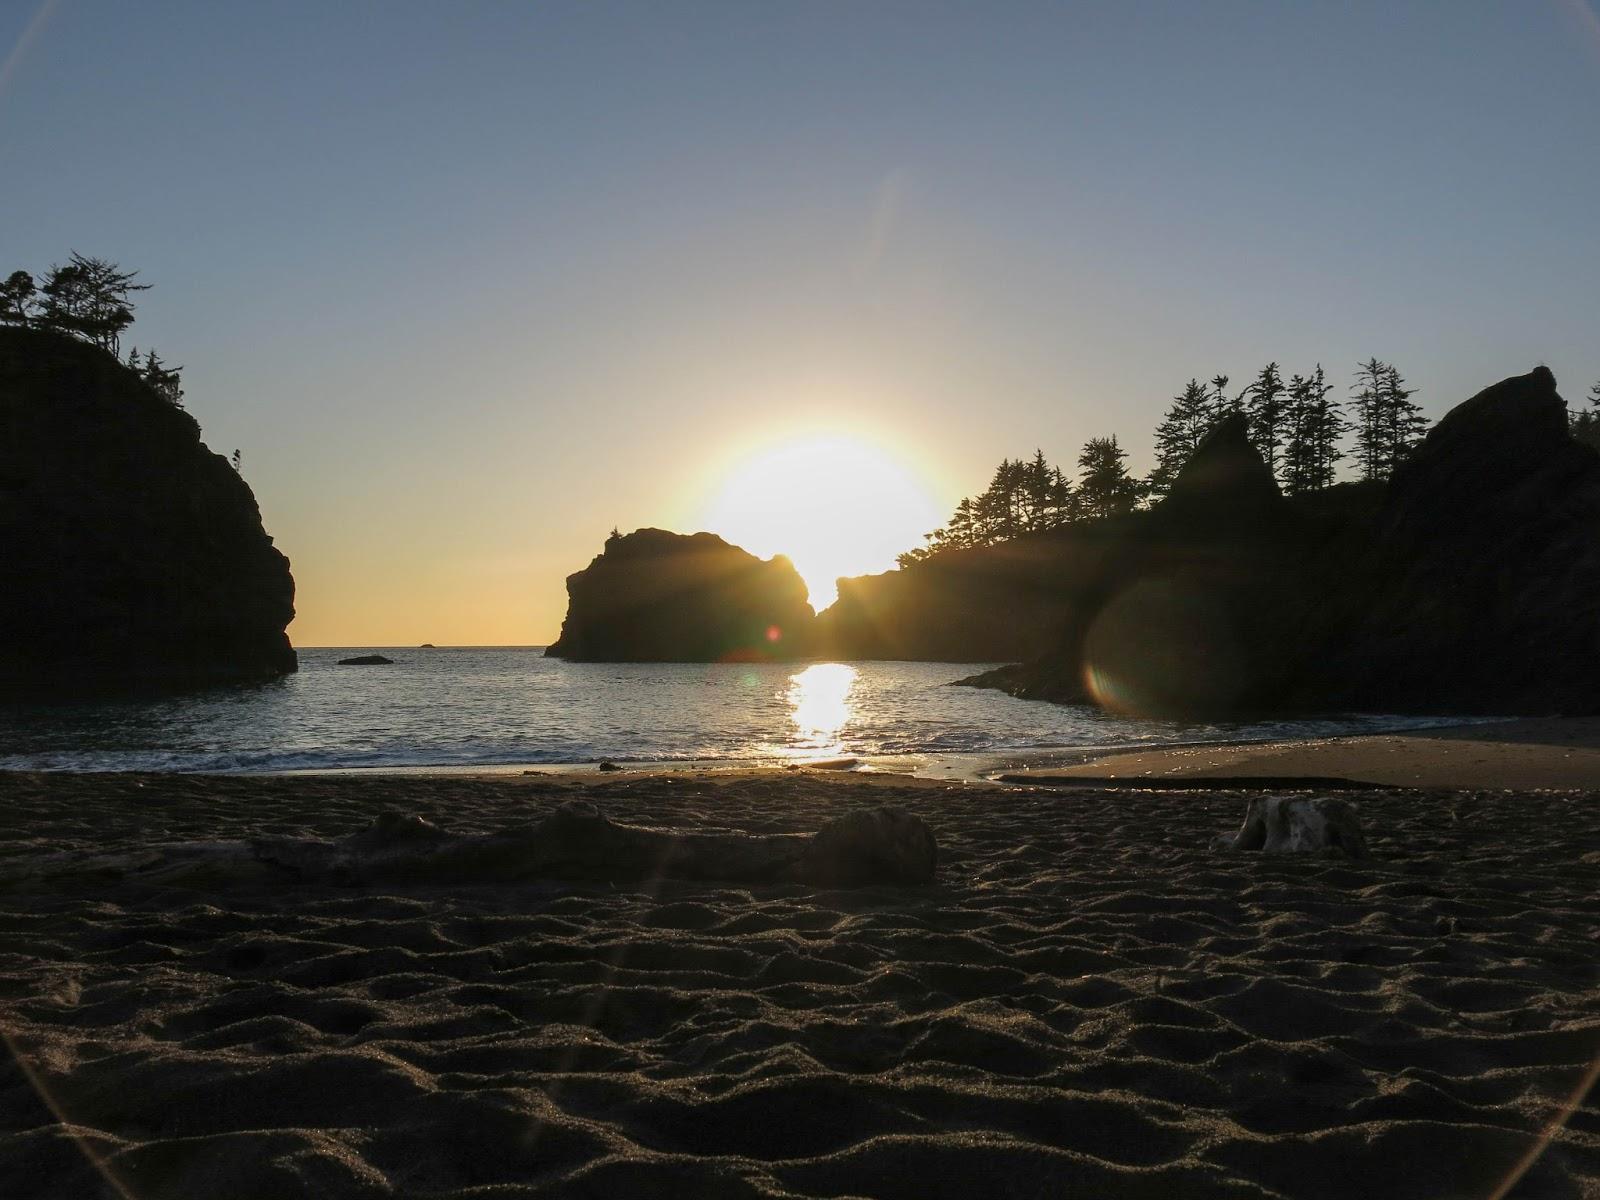 Secret Beach at Sunset, Brookings, OR